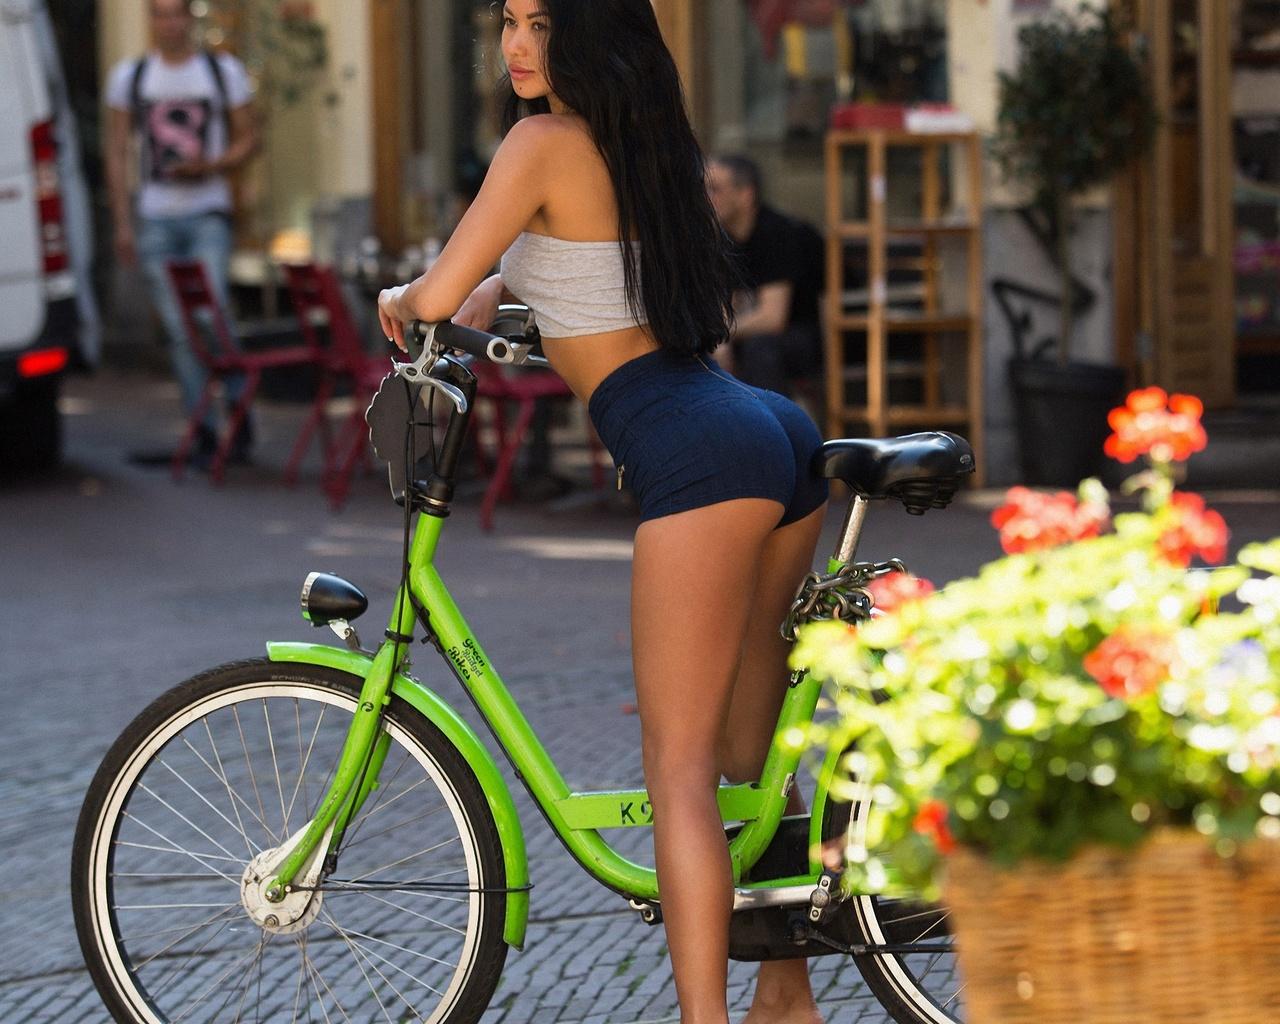 aleksandr mavrin, проф фото, попка, ножки, шорты, брюнетка, велосипед